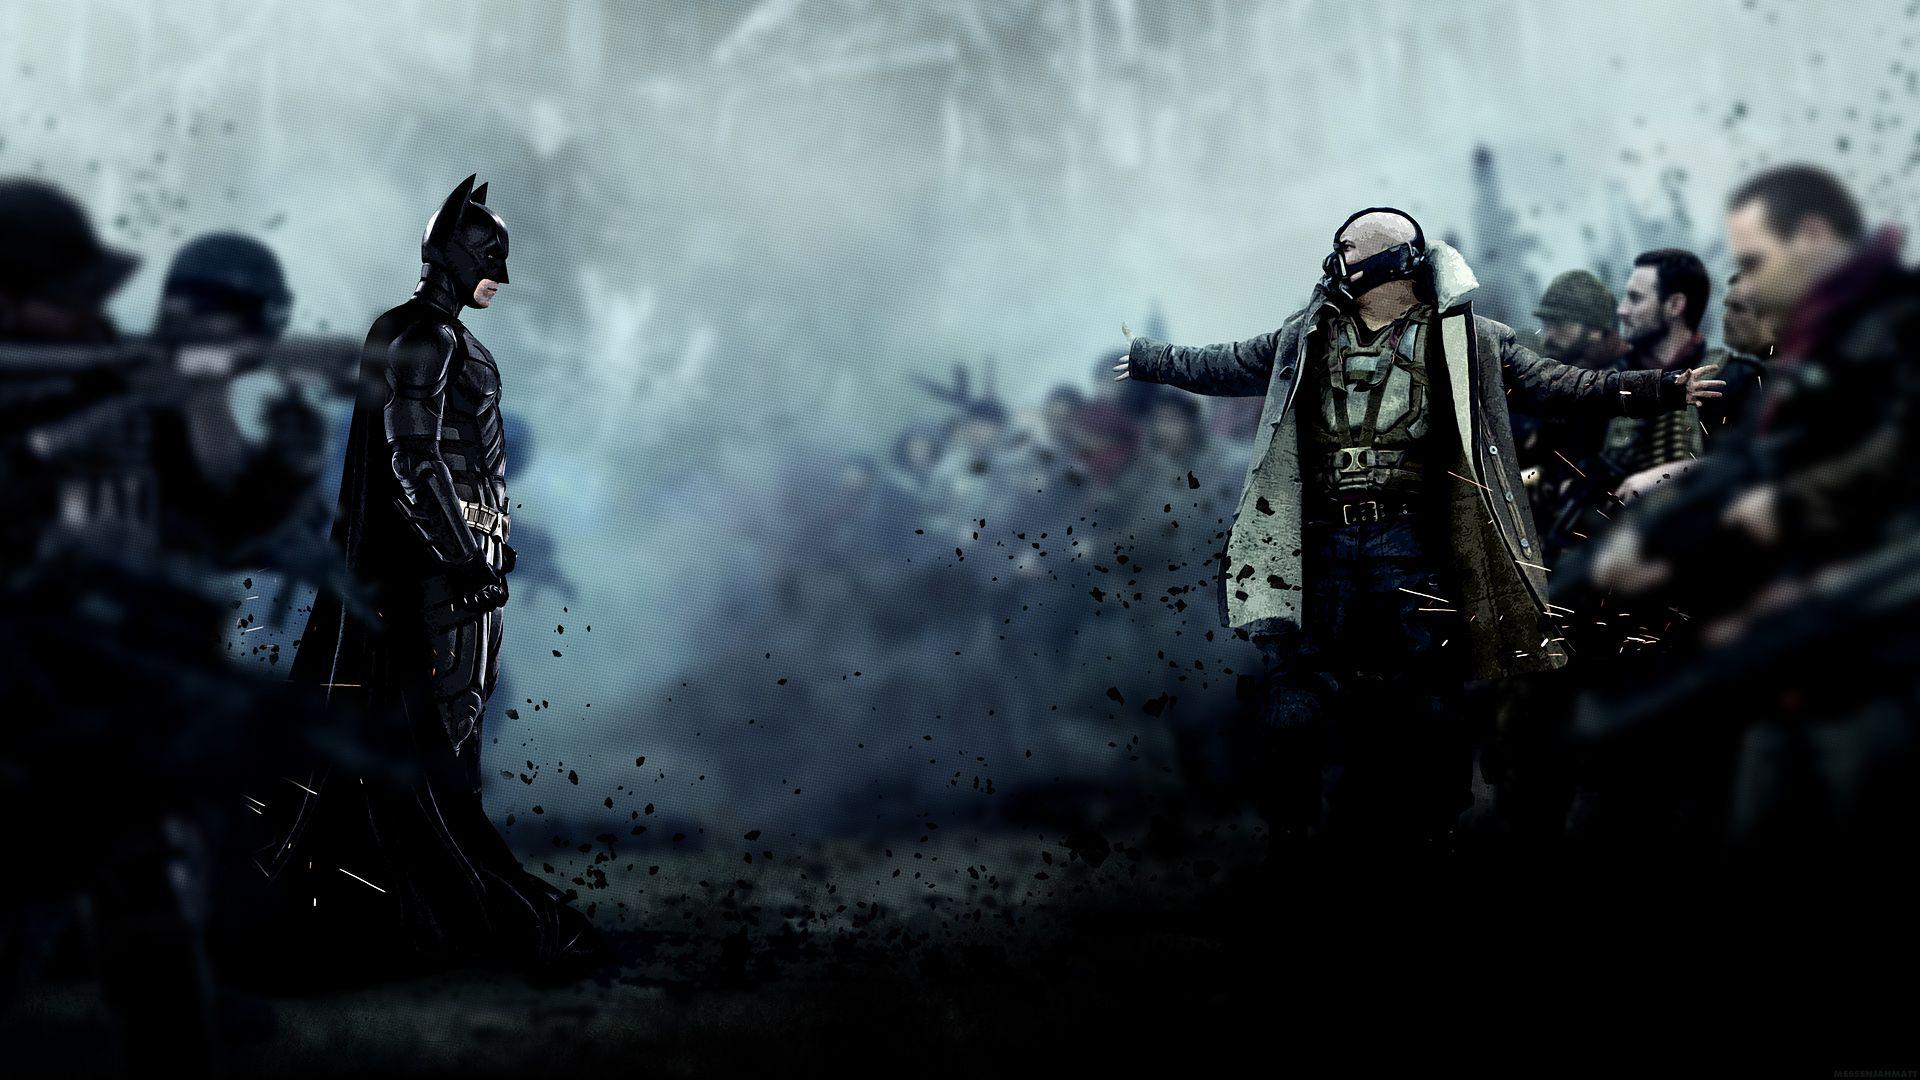 Batman The Dark Knight Rises Wallpapers HD Desktop and Mobile